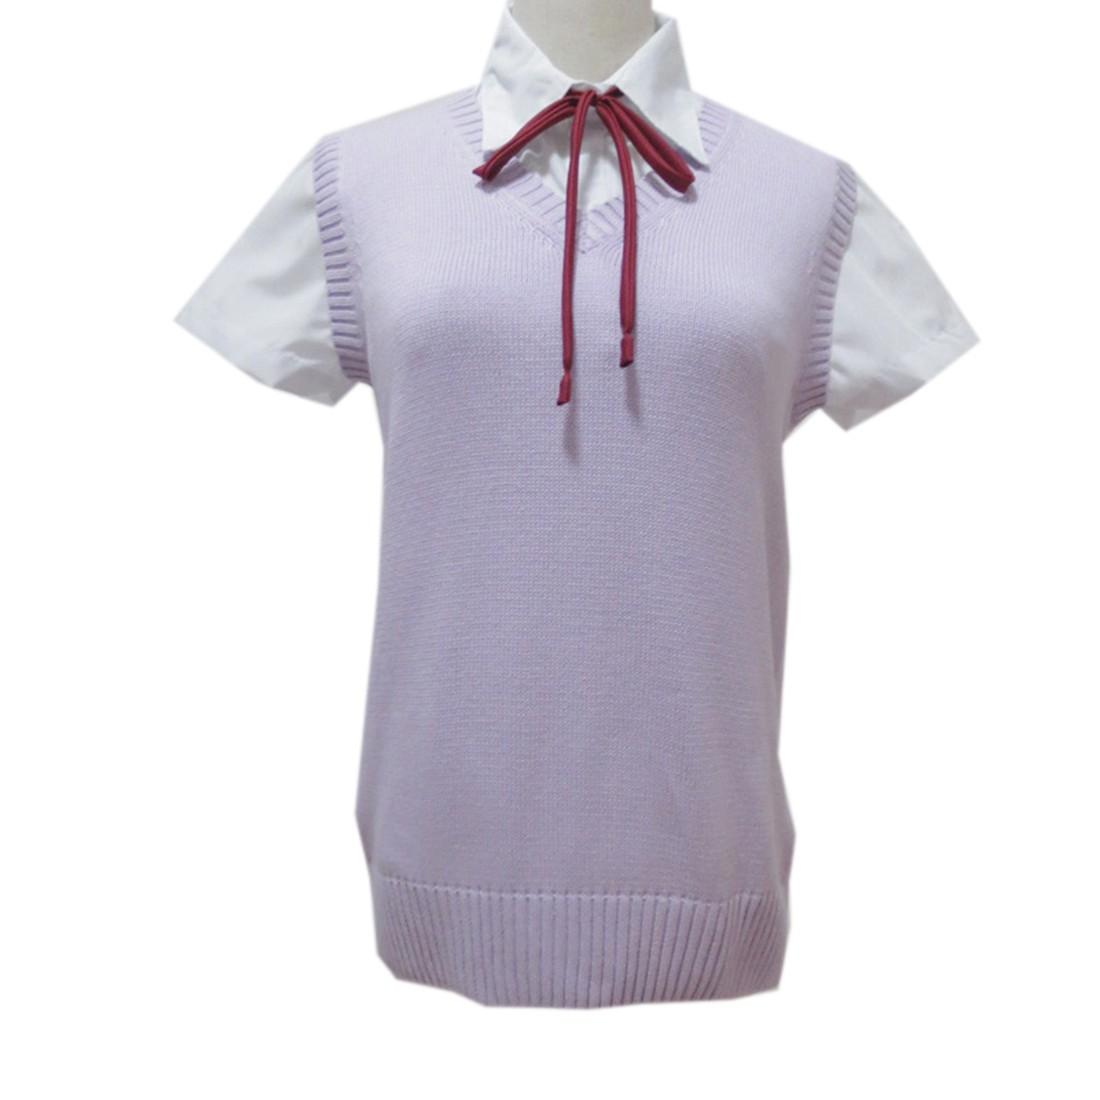 Women sleeveless v neck cotton knitting sweater school for Womens school uniform shirts